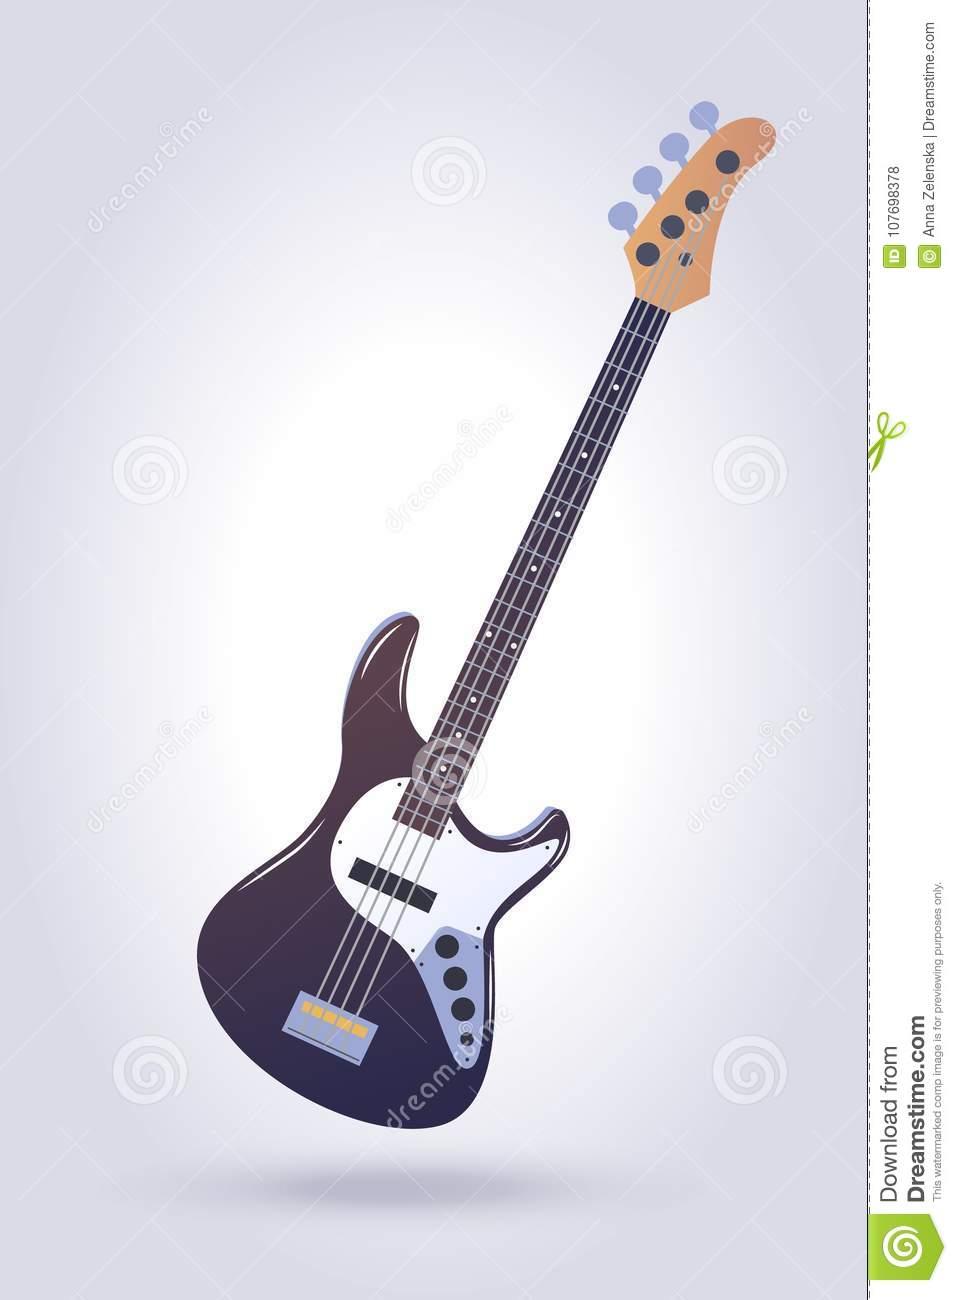 Electric bass guitar stock vector. Illustration of guitar.